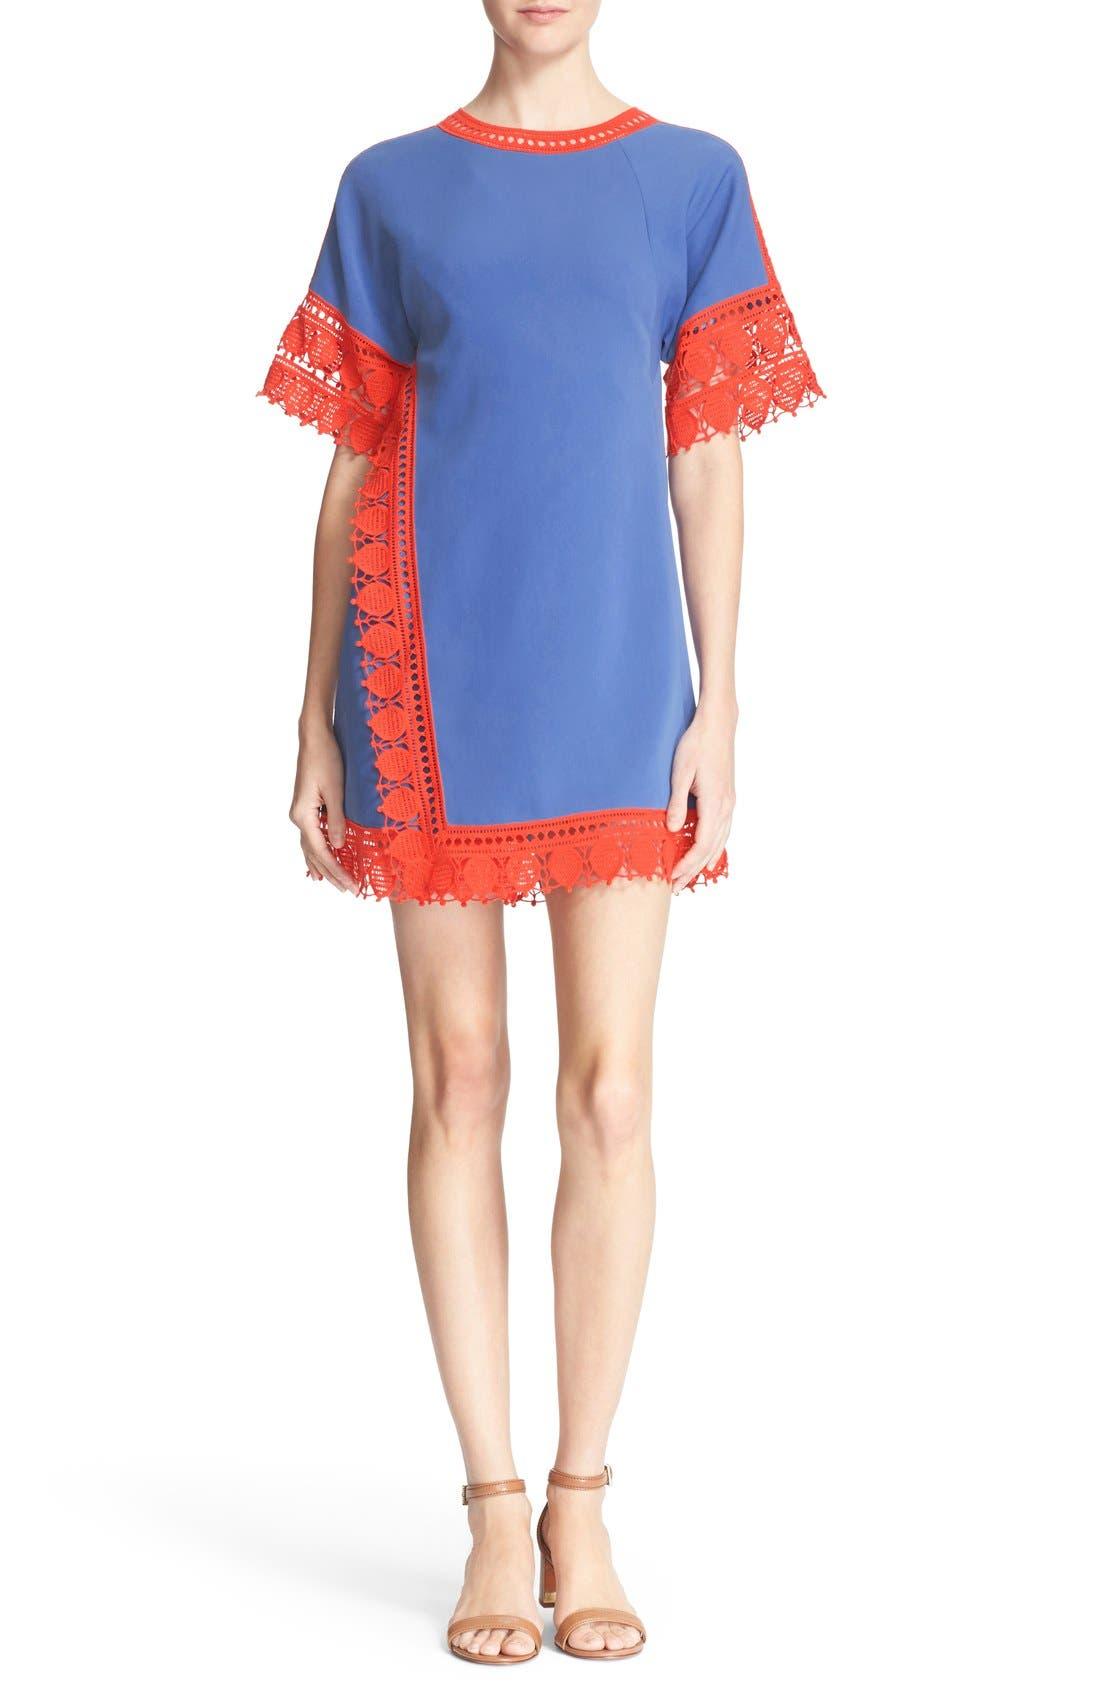 Alternate Image 1 Selected - Tory Burch 'Marissa' Lace Trim Dress